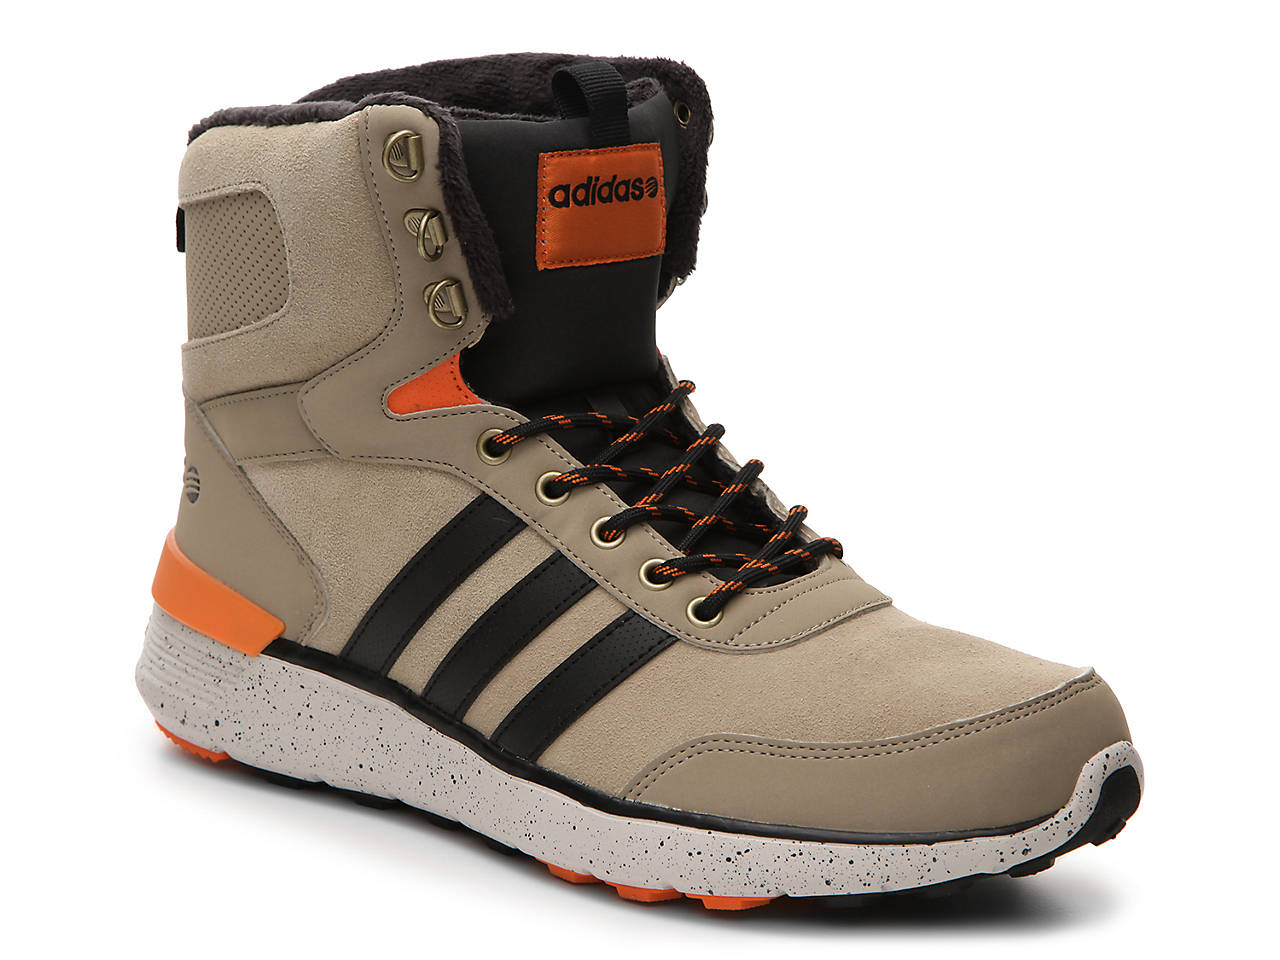 bda67681cb75 adidas NEO Lite Racer High-Top Sneaker - Men s Men s Shoes